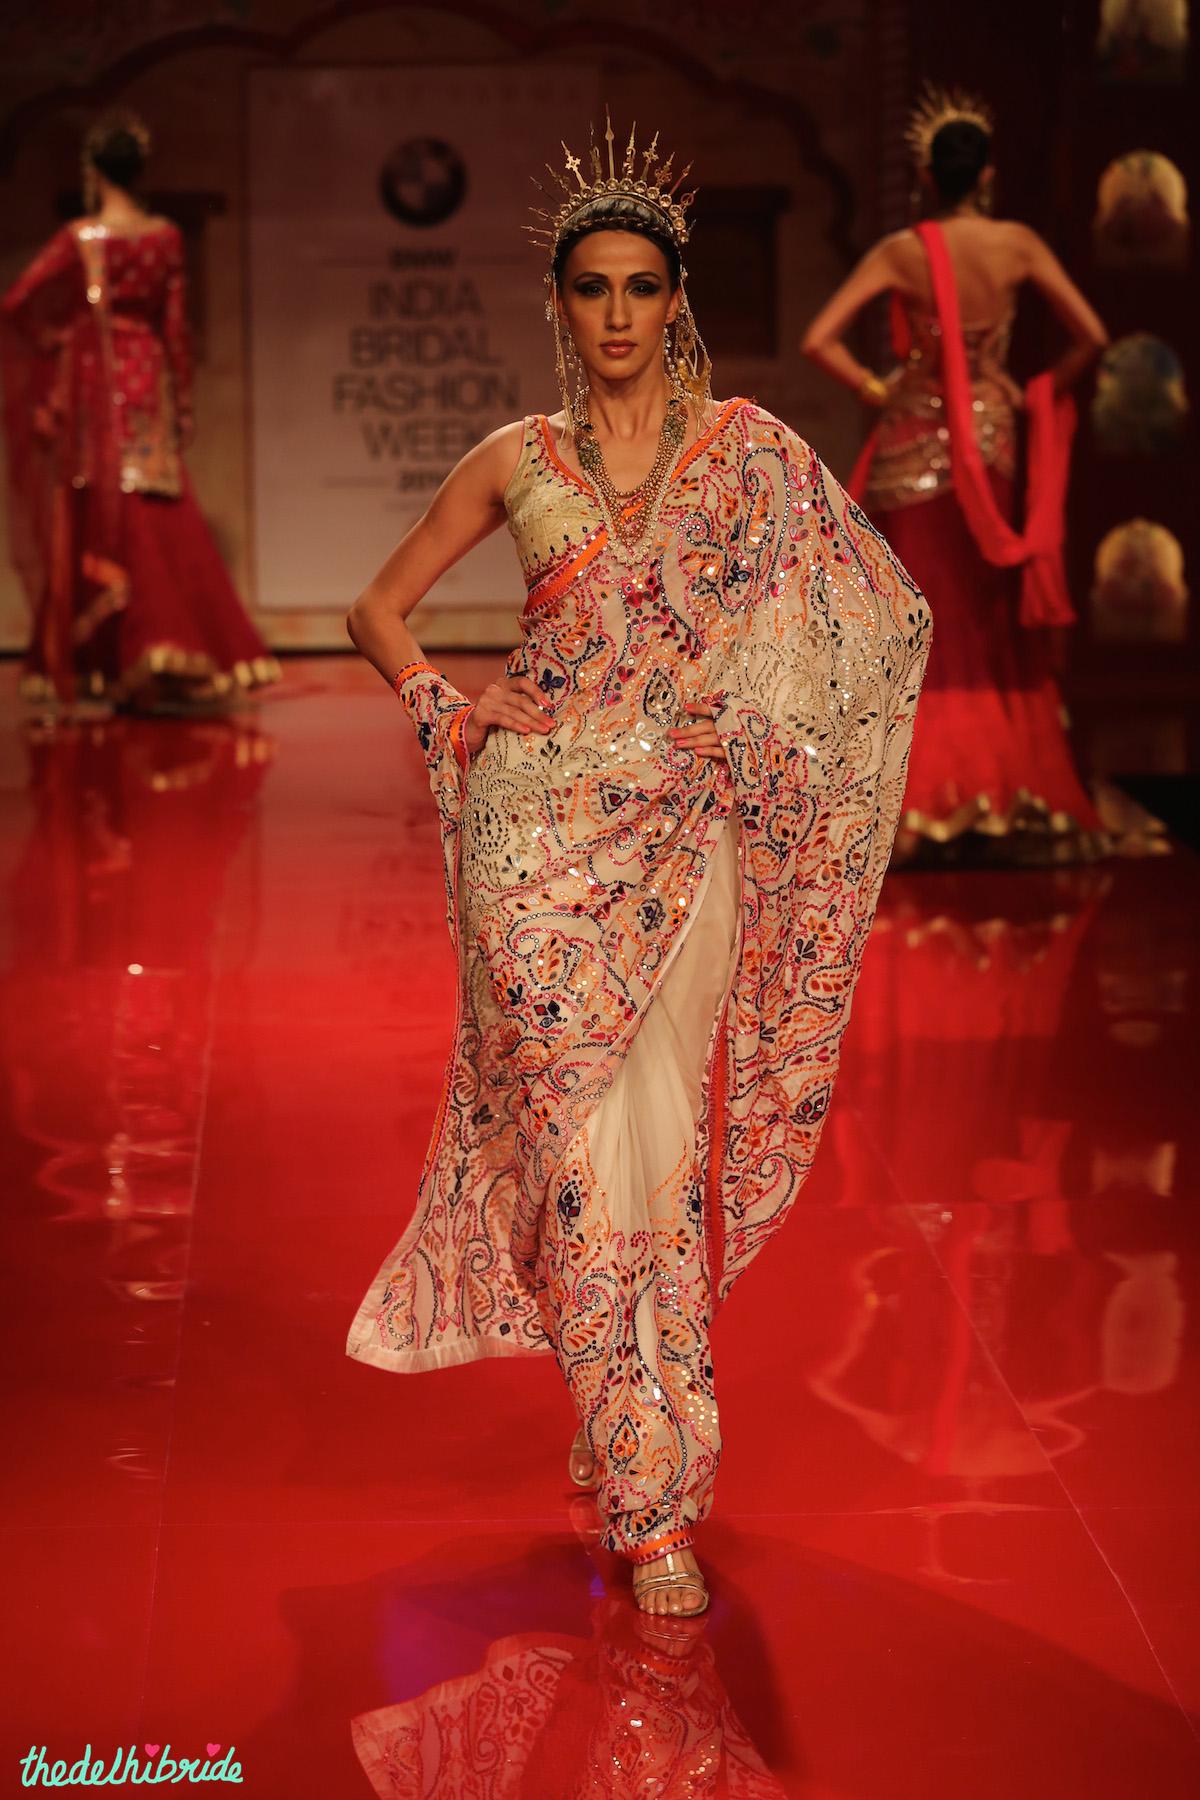 Suneet Varma at India Bridal Fashion Week 2014  thedelhibride  An Indian Wedding Blog